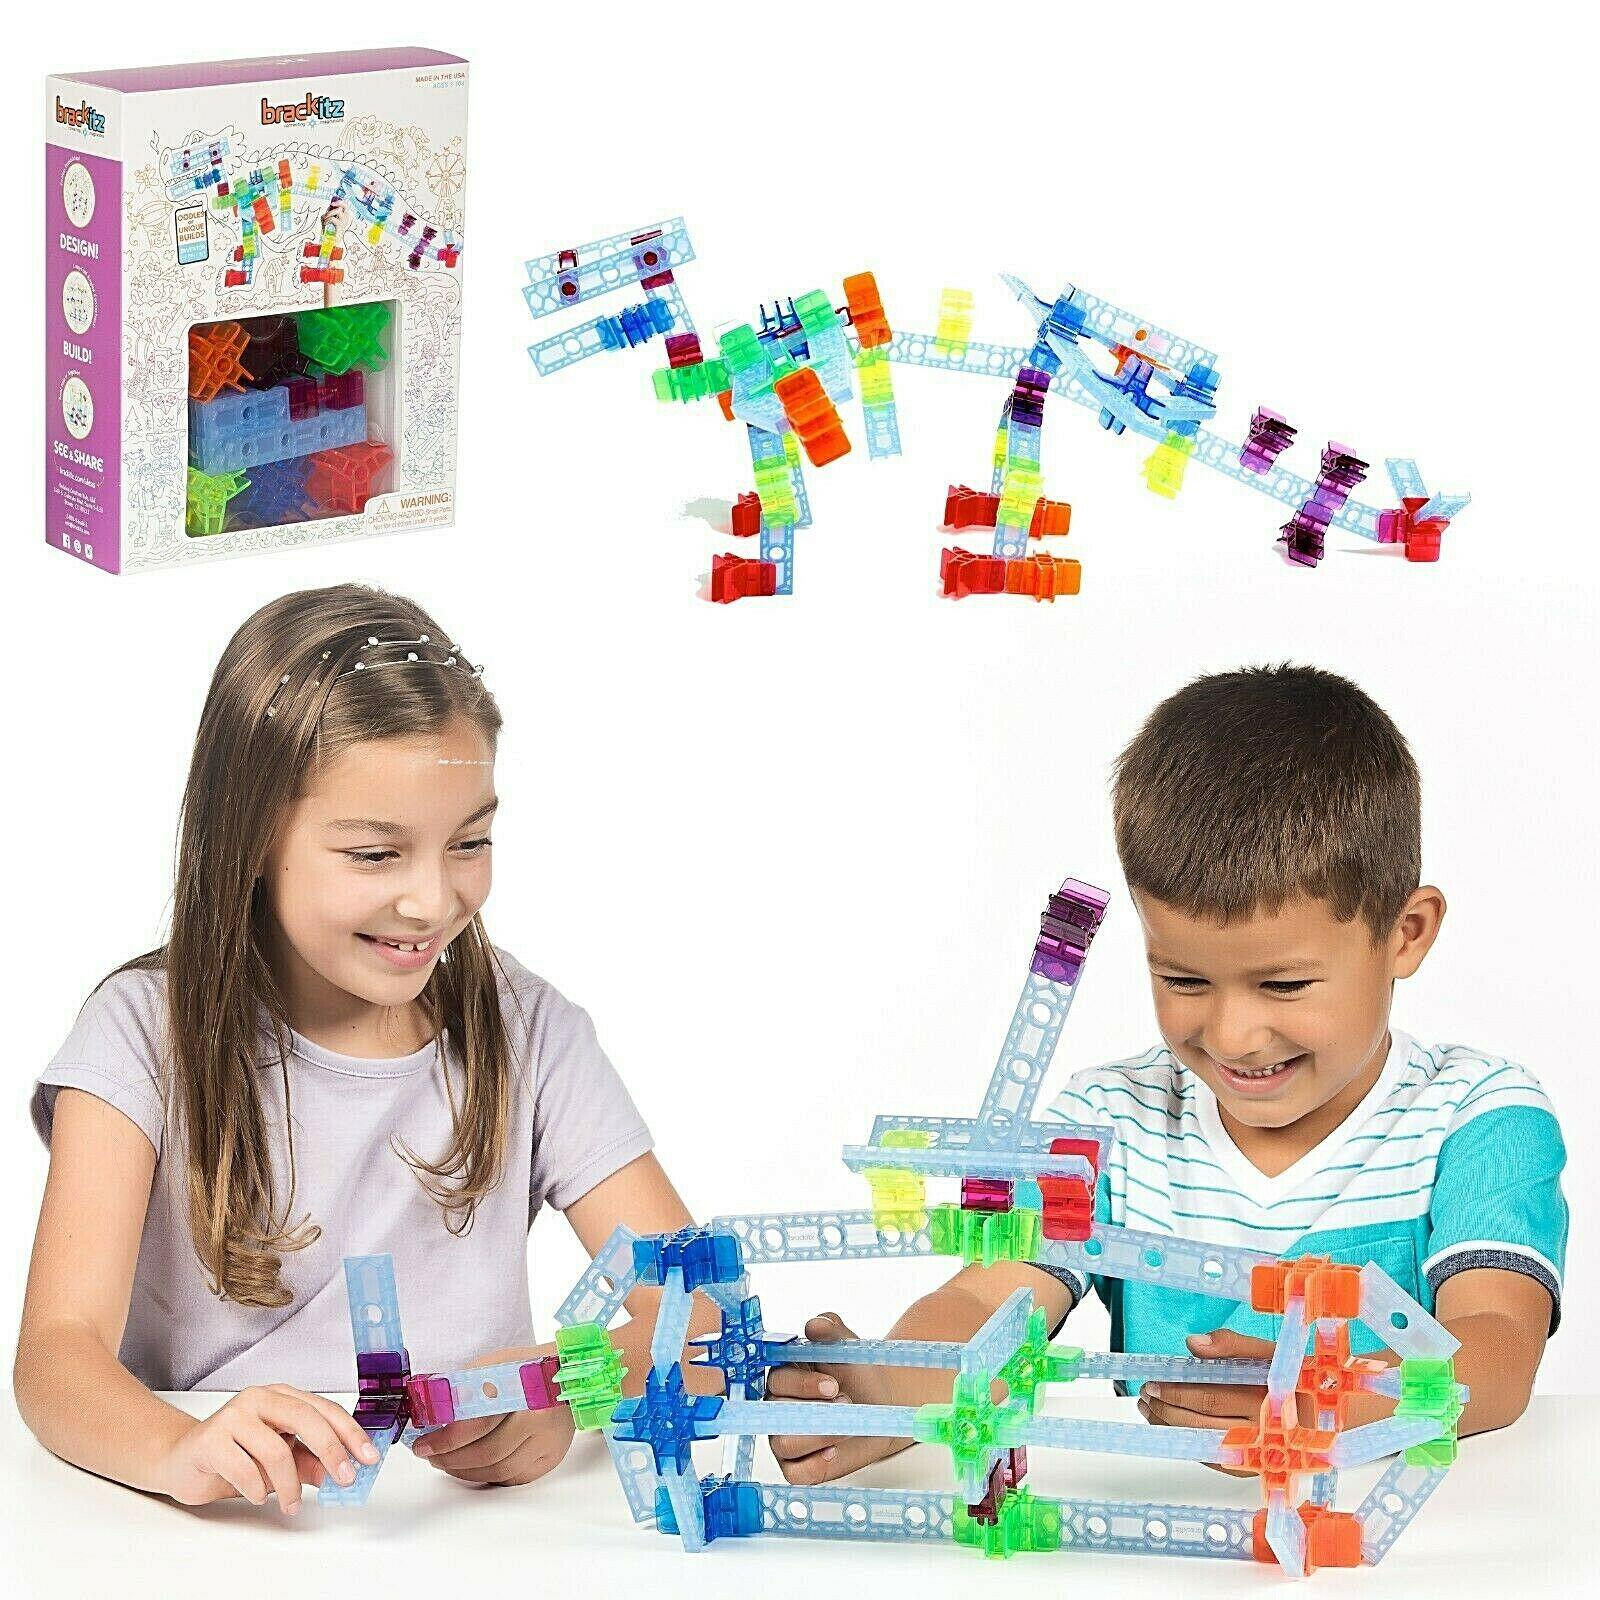 100-pc-brackitz-inventor-stem-building-toy-teaching-kids-at-home-homeschool